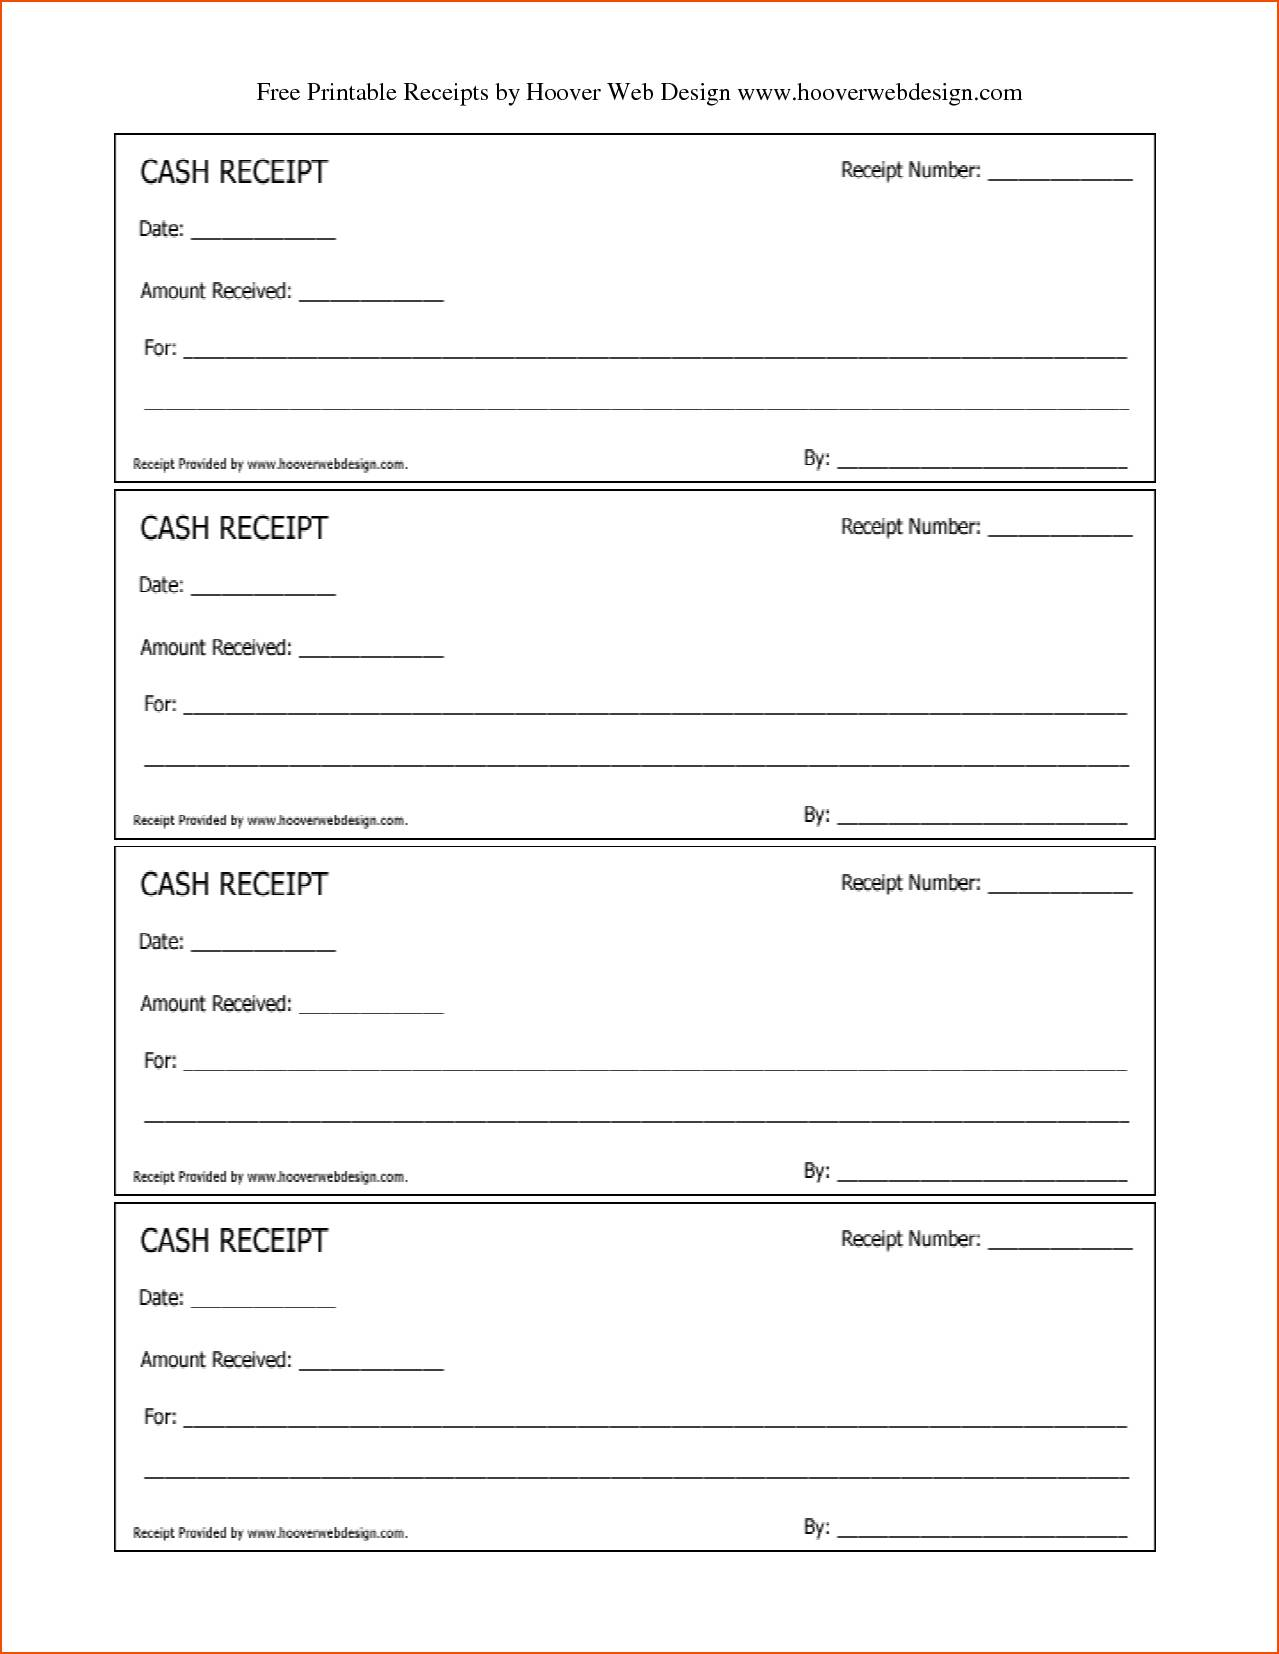 Printable Receipts Templates